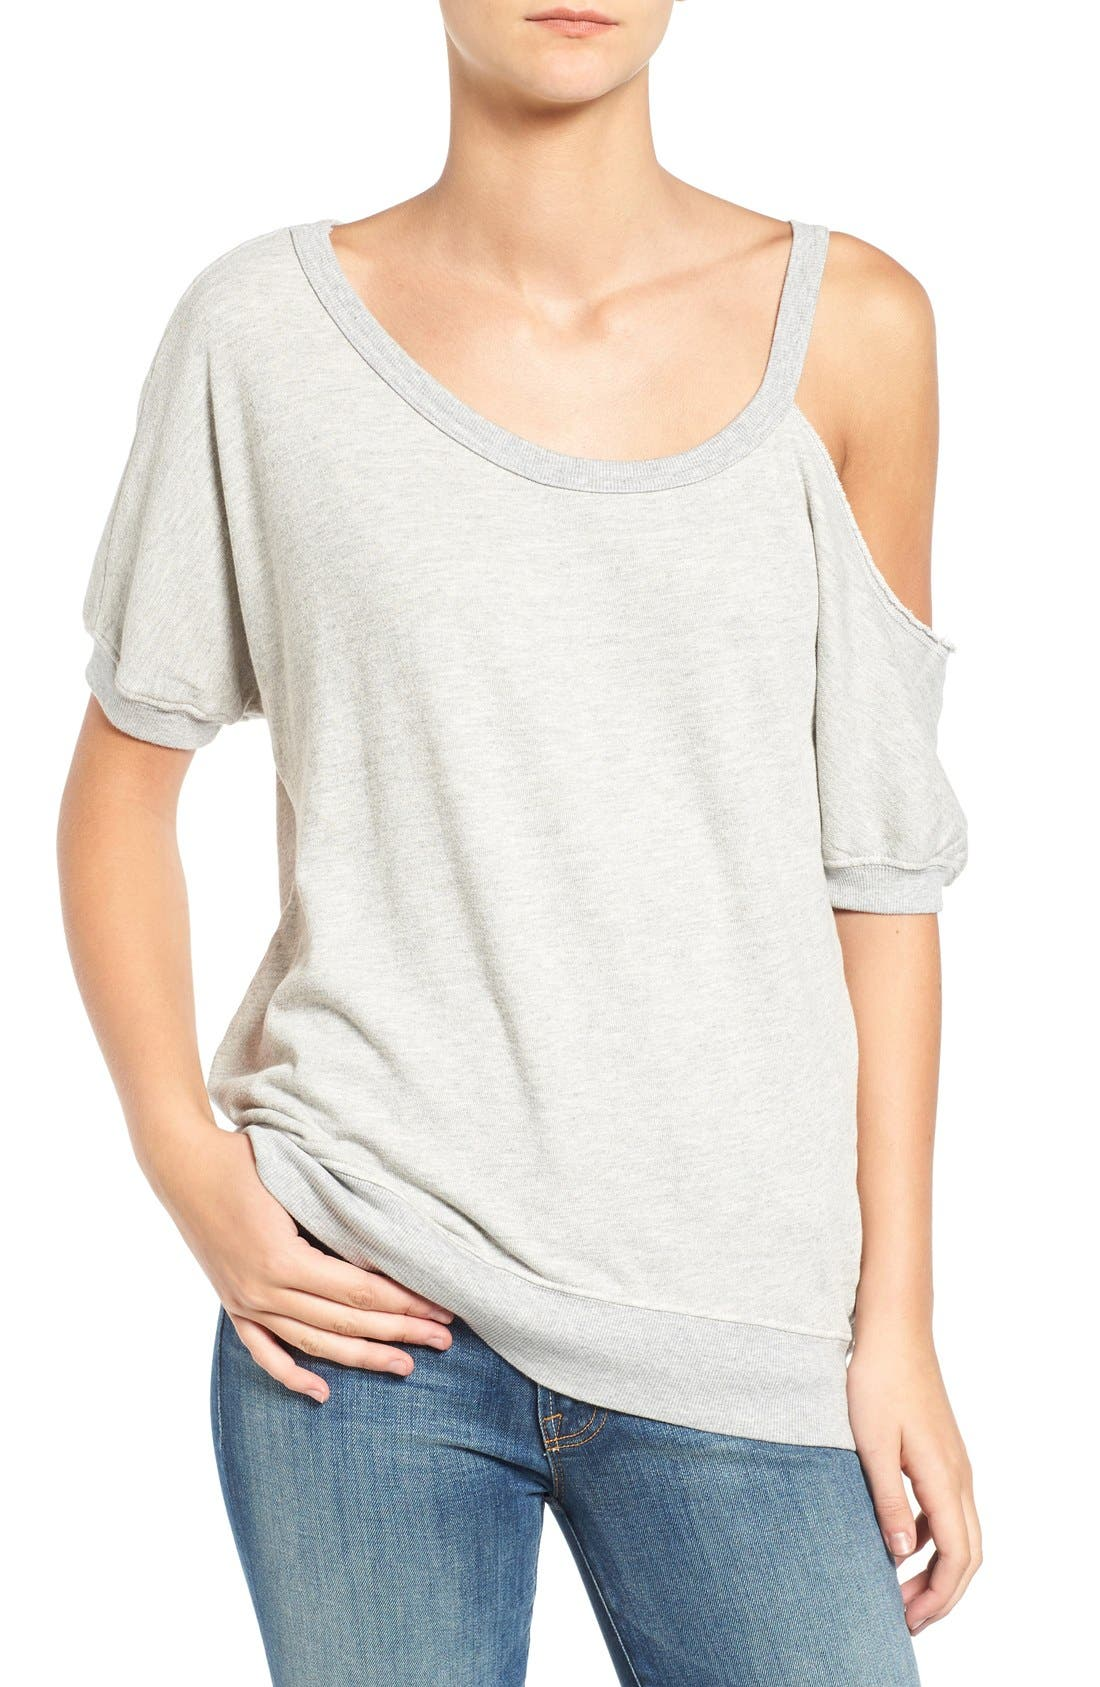 PAM & GELA Distressed Open Shoulder Sweatshirt, Main, color, 031